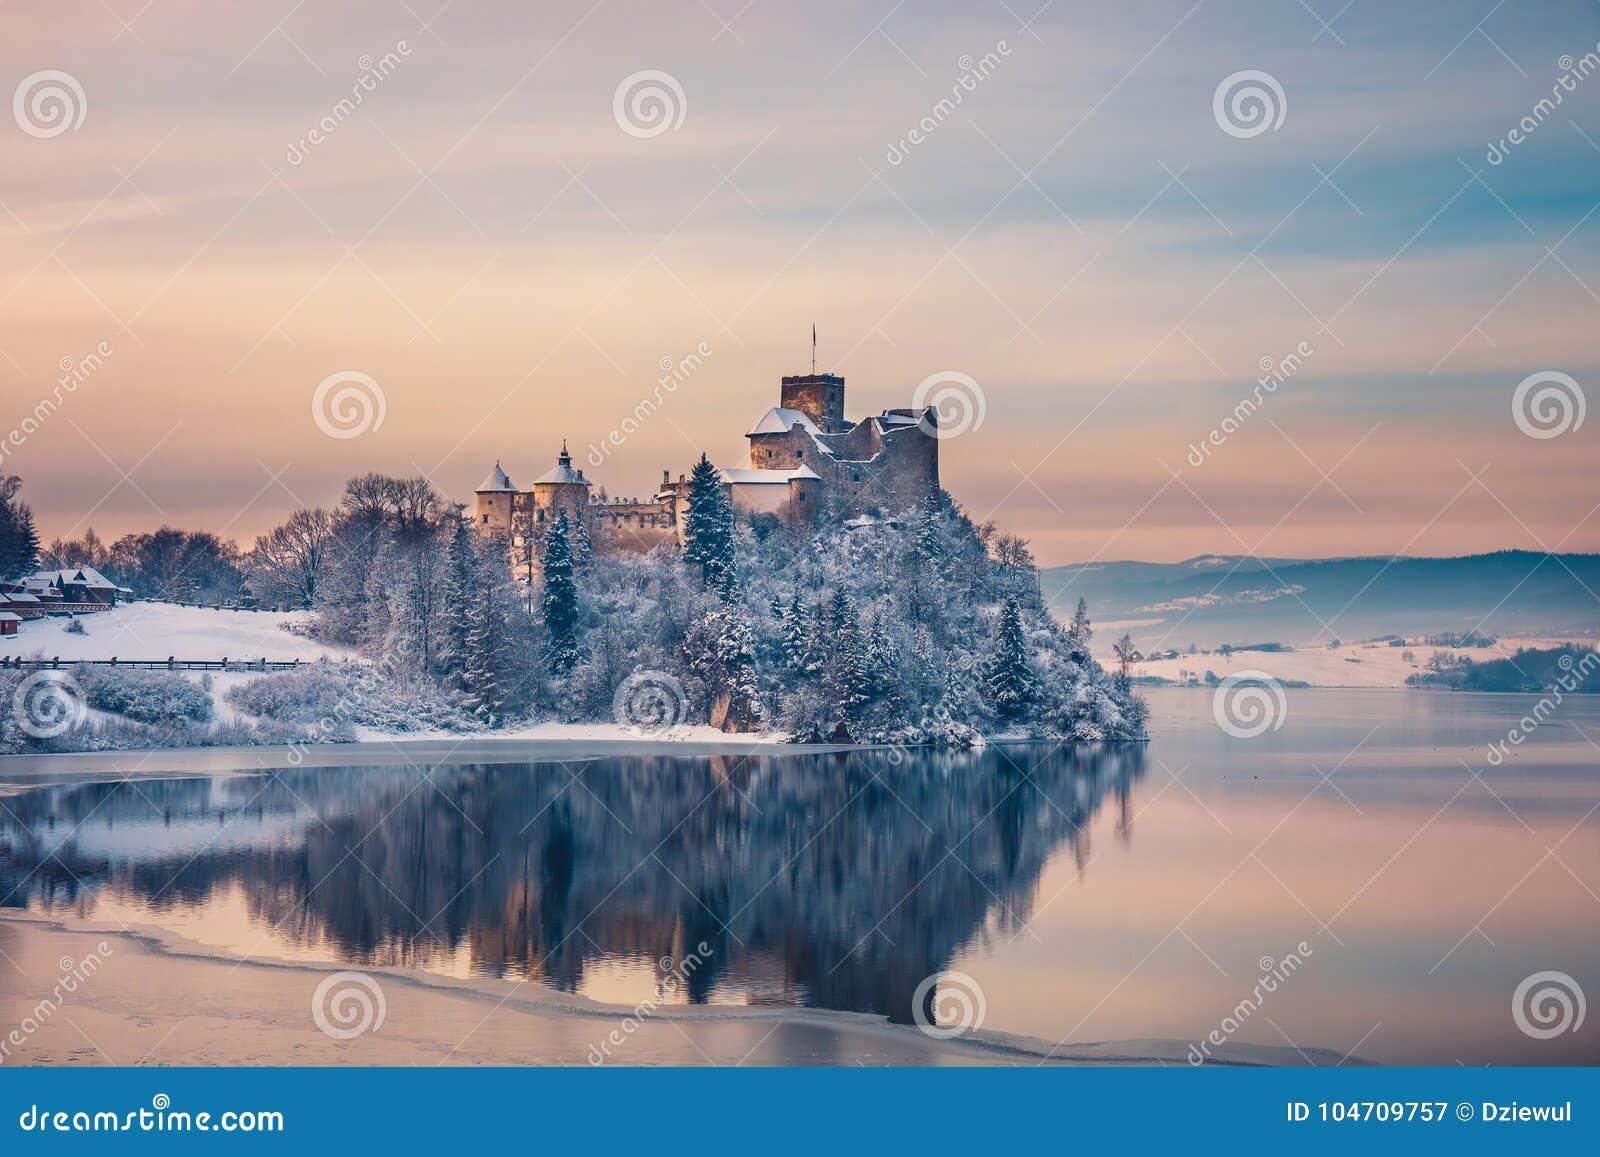 Beautiful view of Niedzica Castle